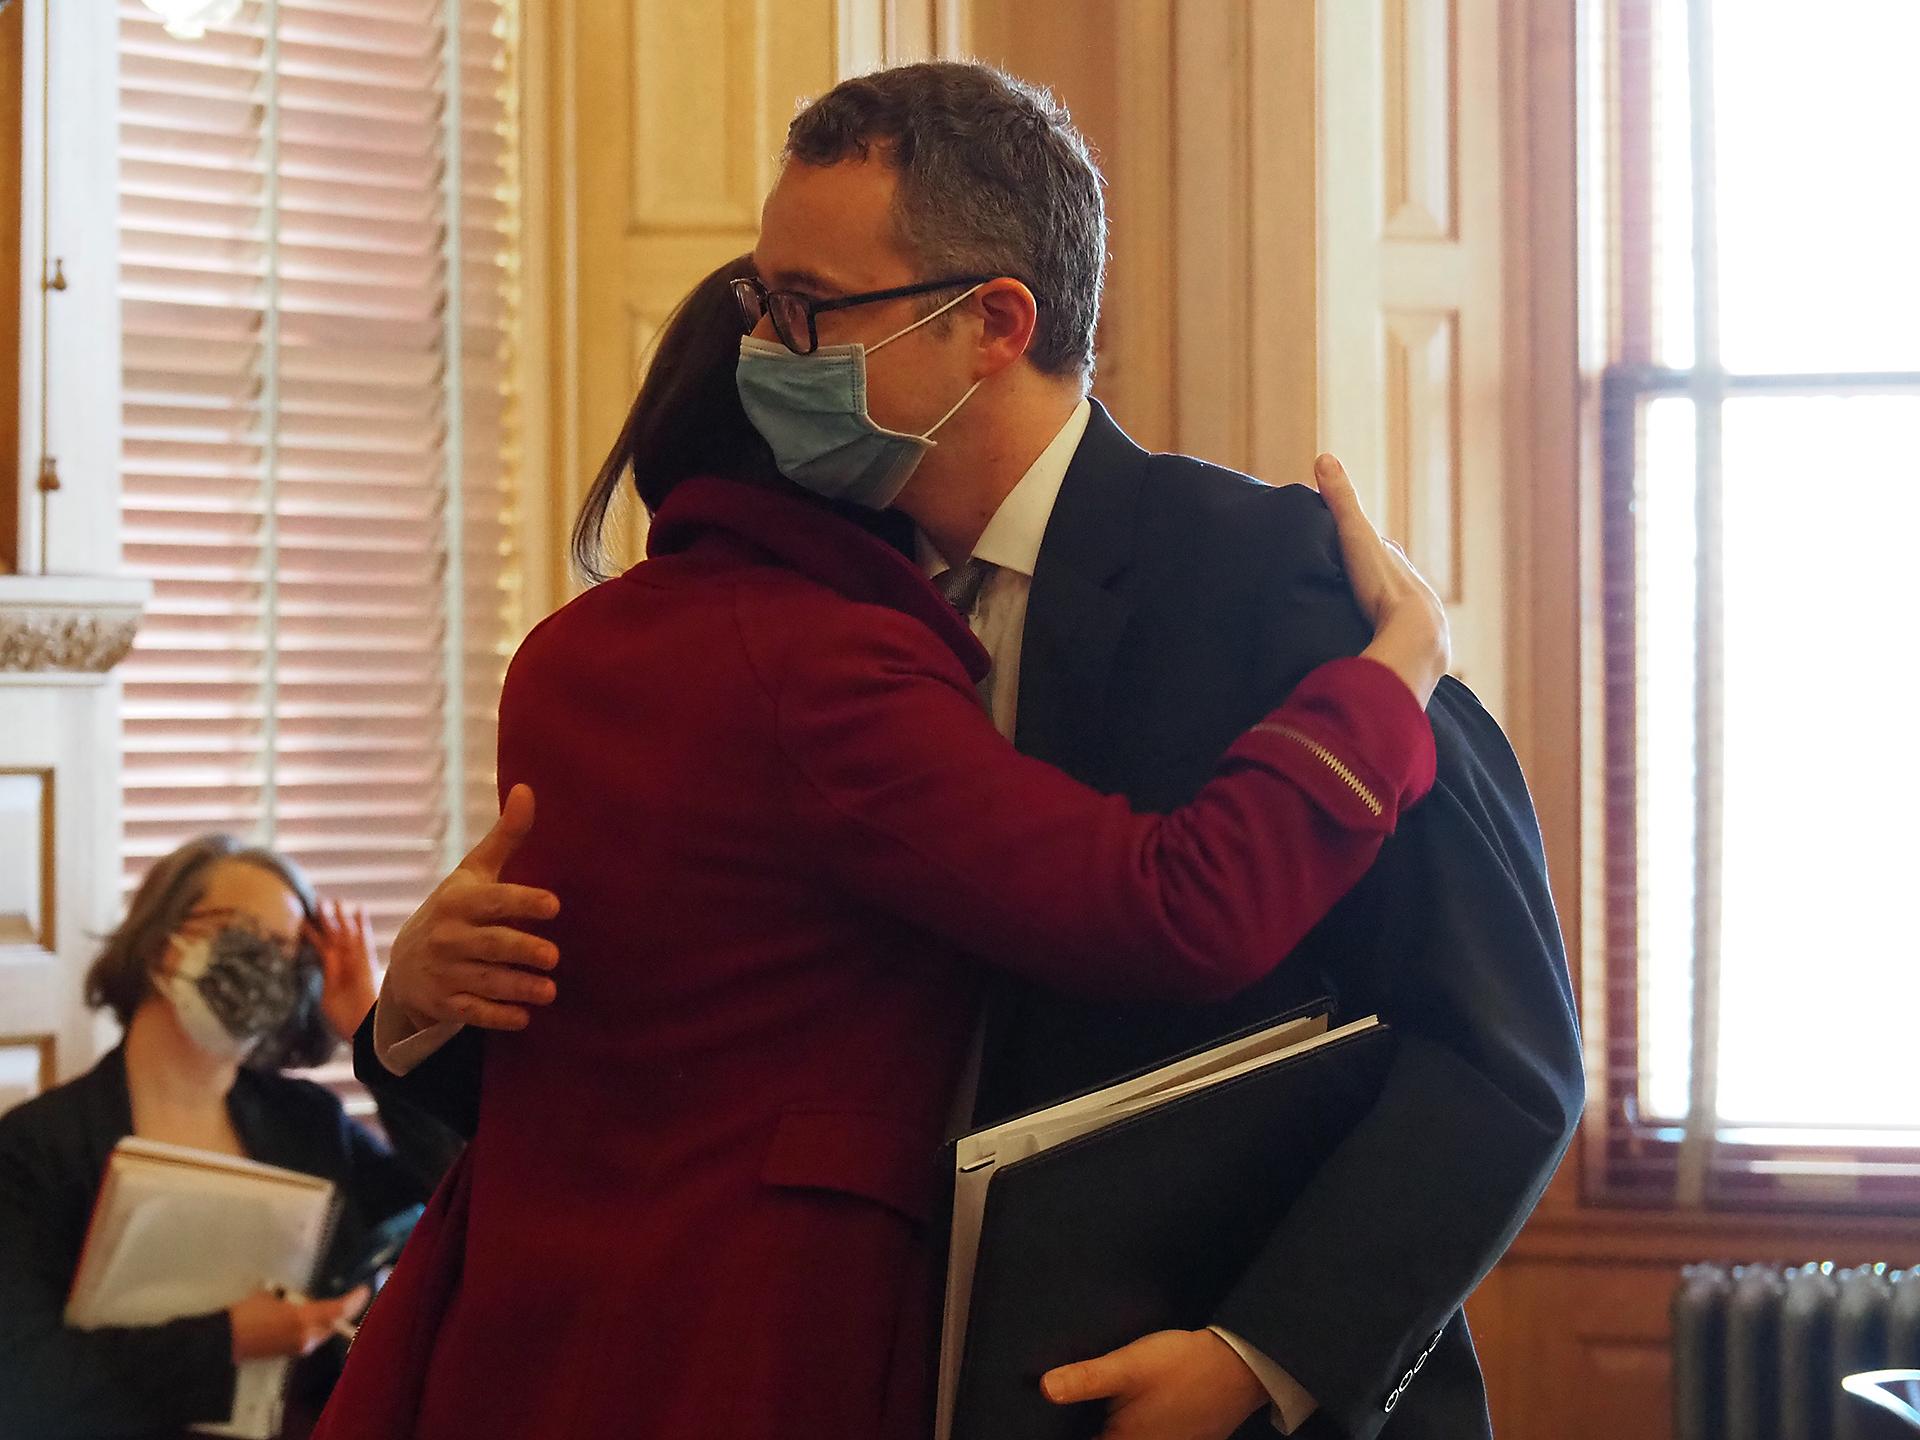 Let's hope 17 Kansas Senators never need a public defender